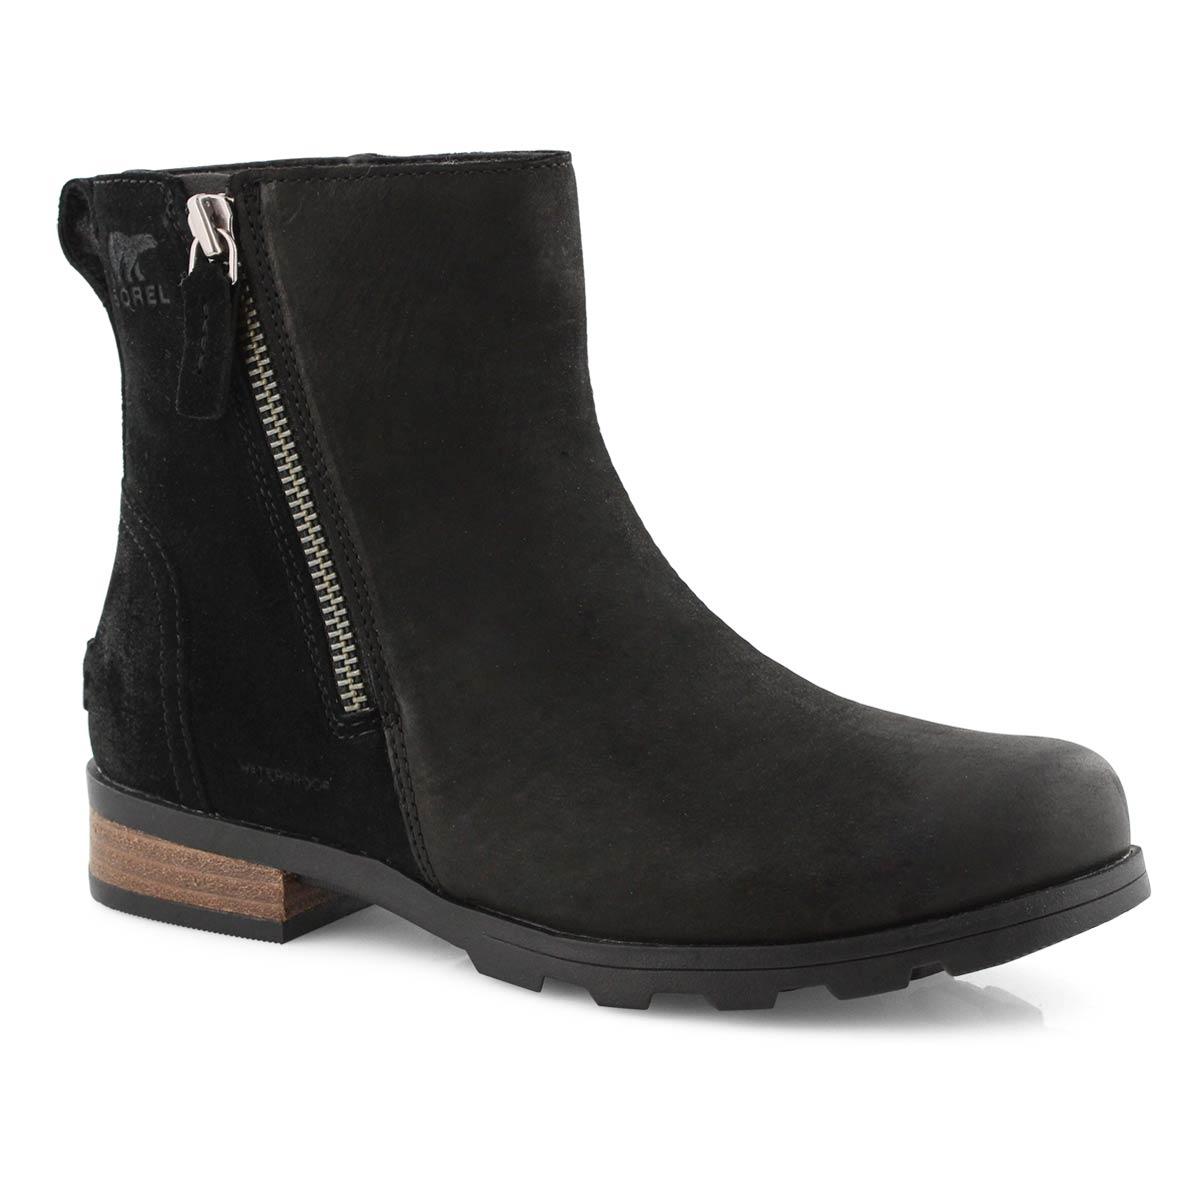 Lds Emelie Zip black wtpf ankle boot